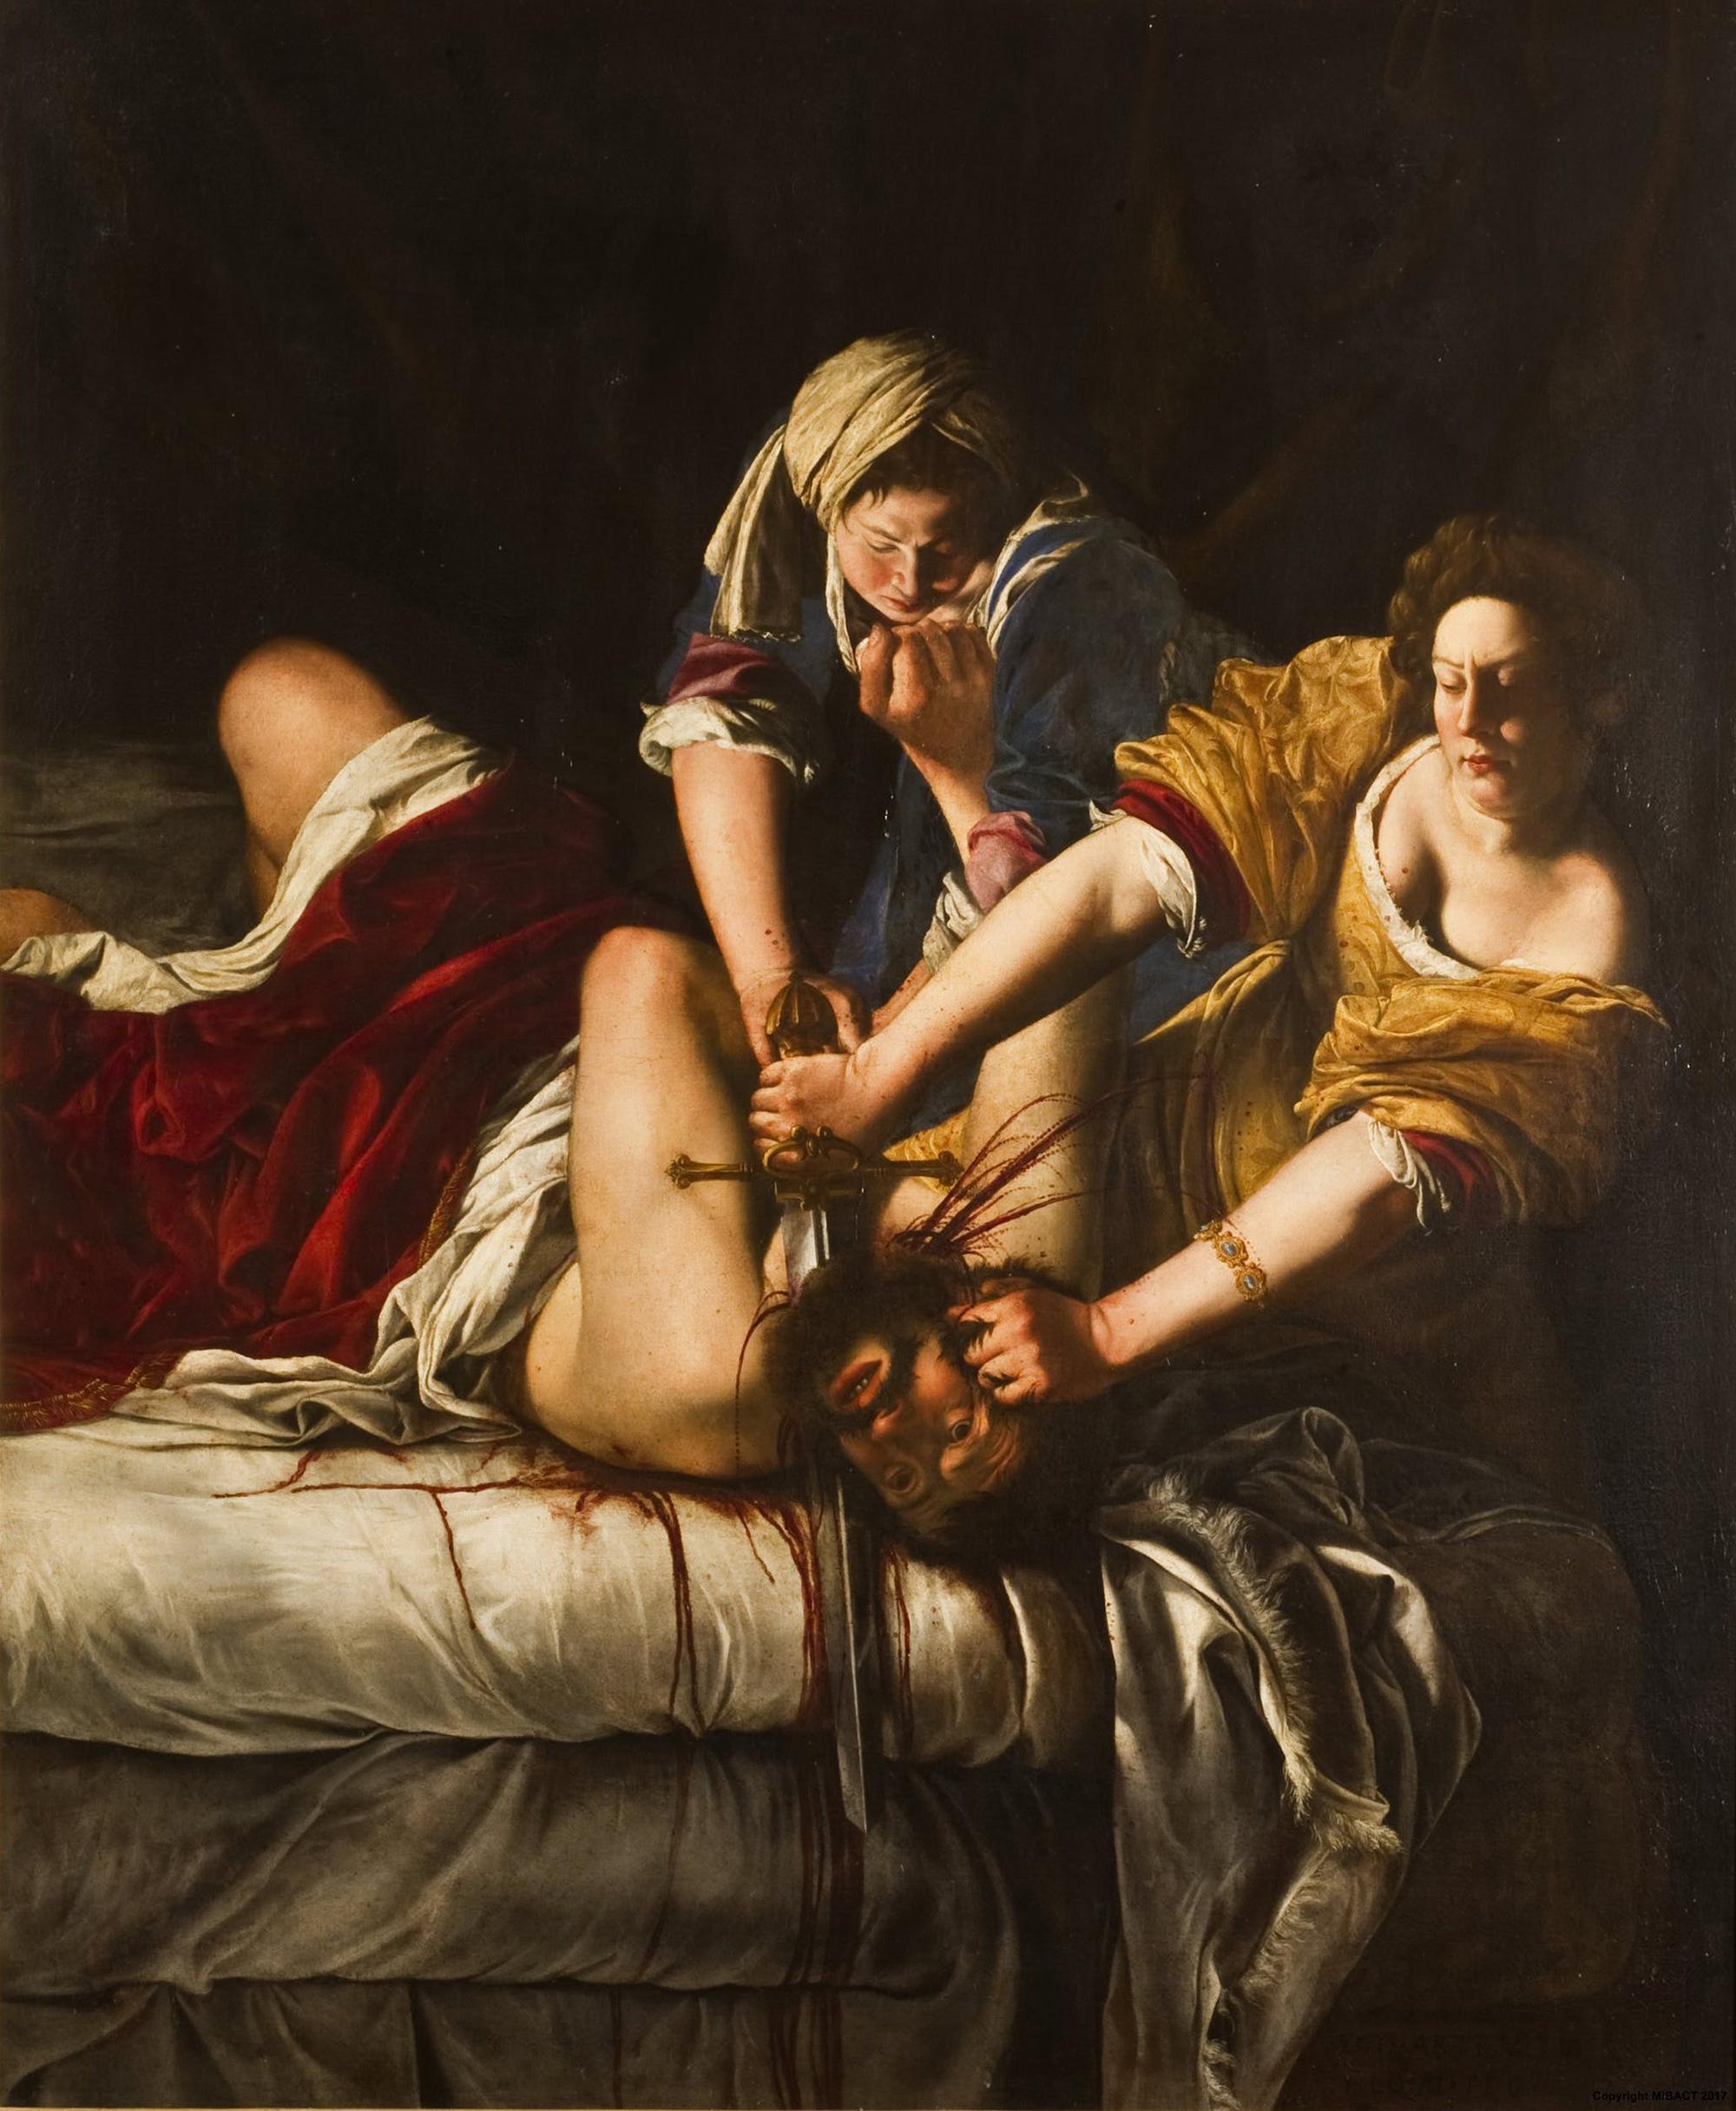 Artemisia Gentileschi, Judith Slaying Holofernes,